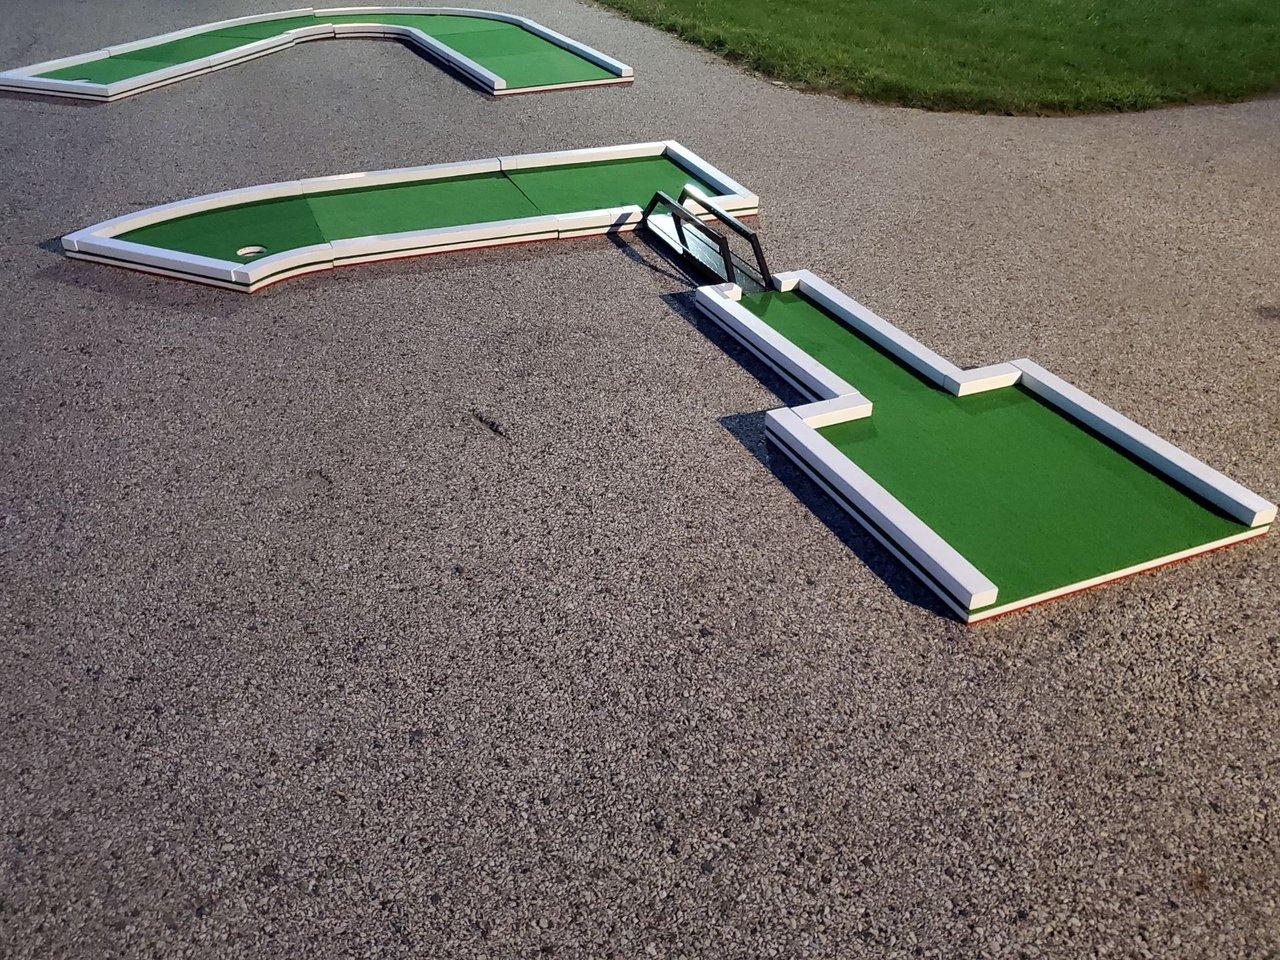 Thomas Jefferson University Welcome Week photo Mini-Golf-Rental-Philly-Green-Fairway-Drawbridge-Obstacle-Front-View.jpg